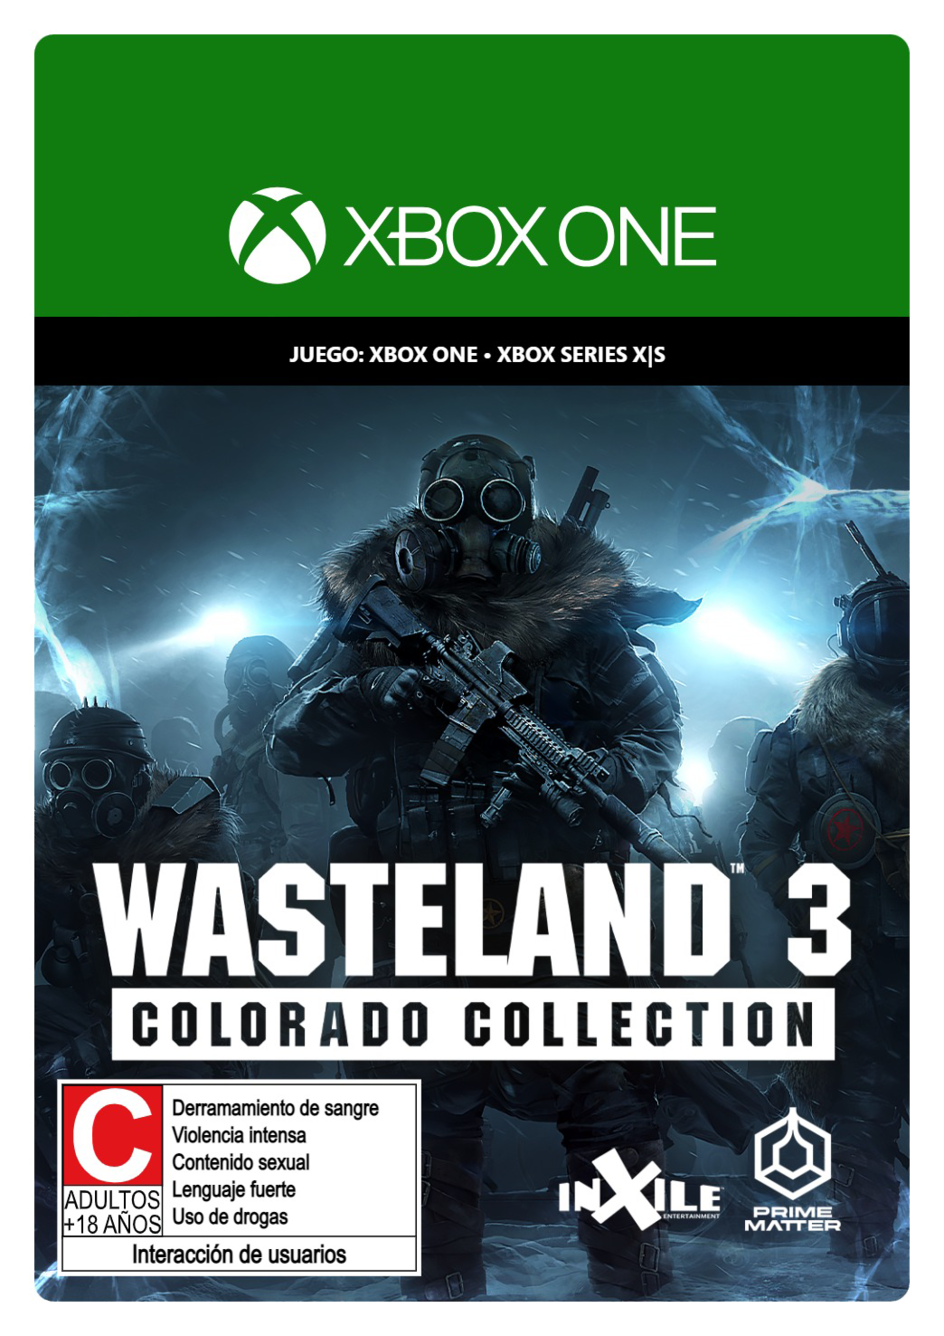 XBOX Wasteland 3 Colorado Collection - Xbox One